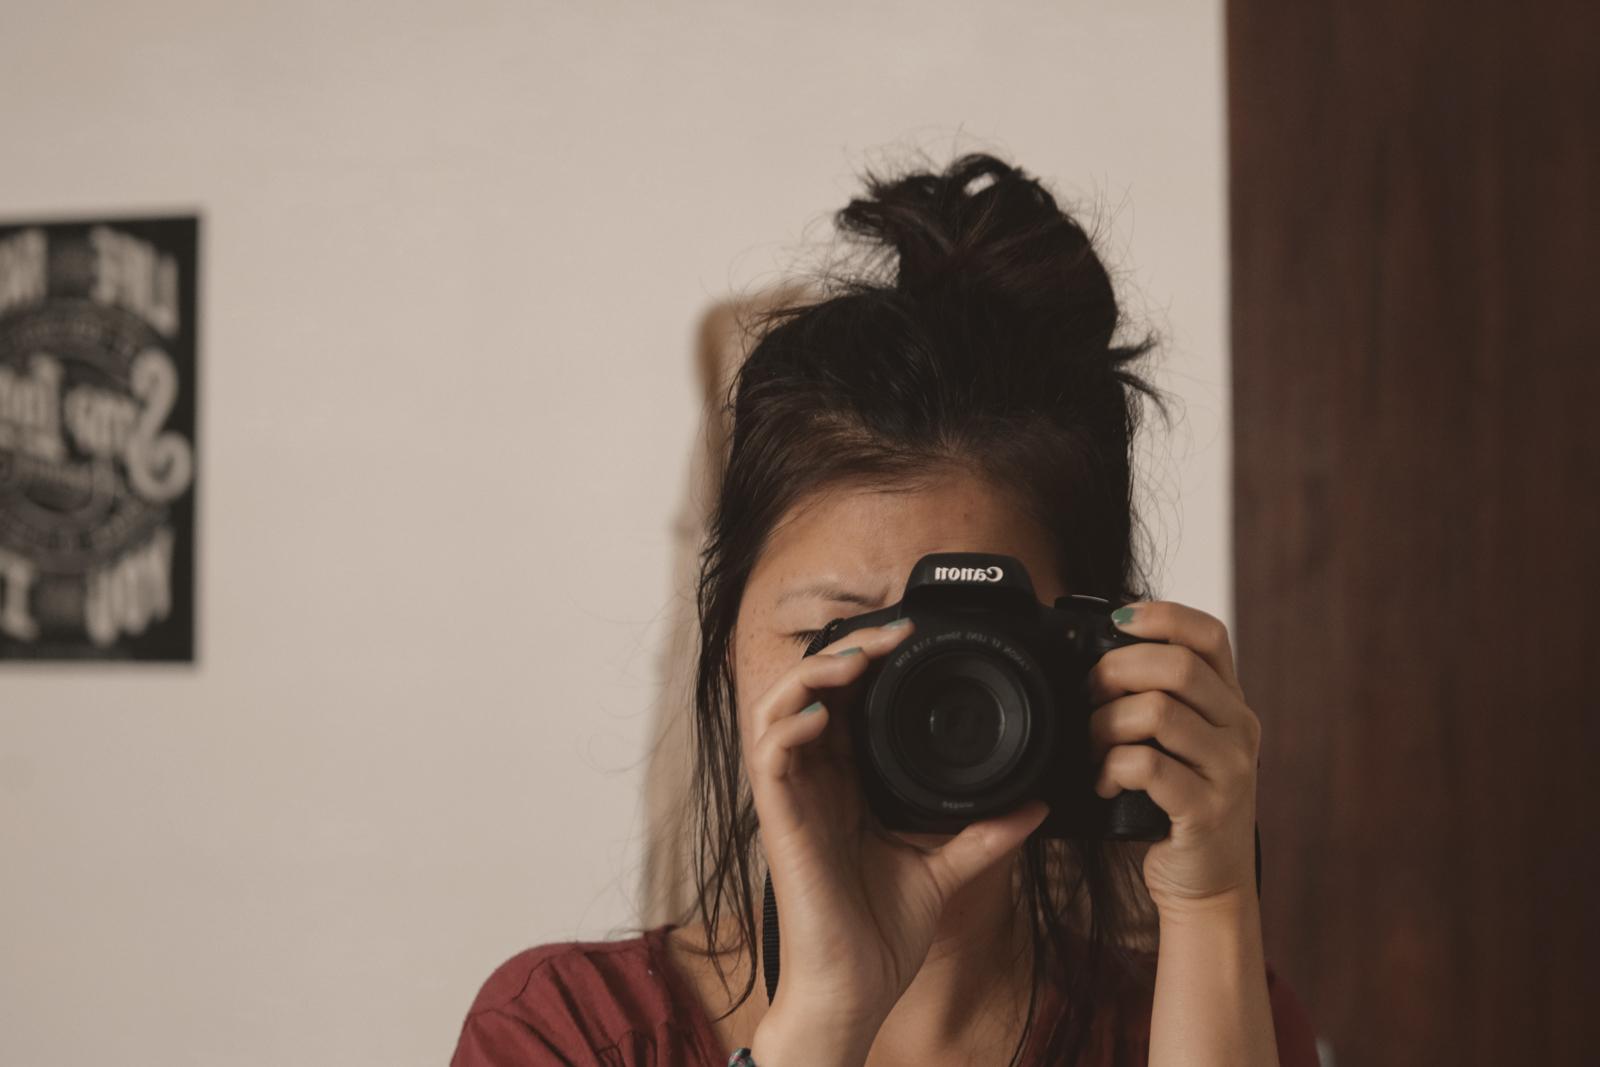 garota fotografando canon